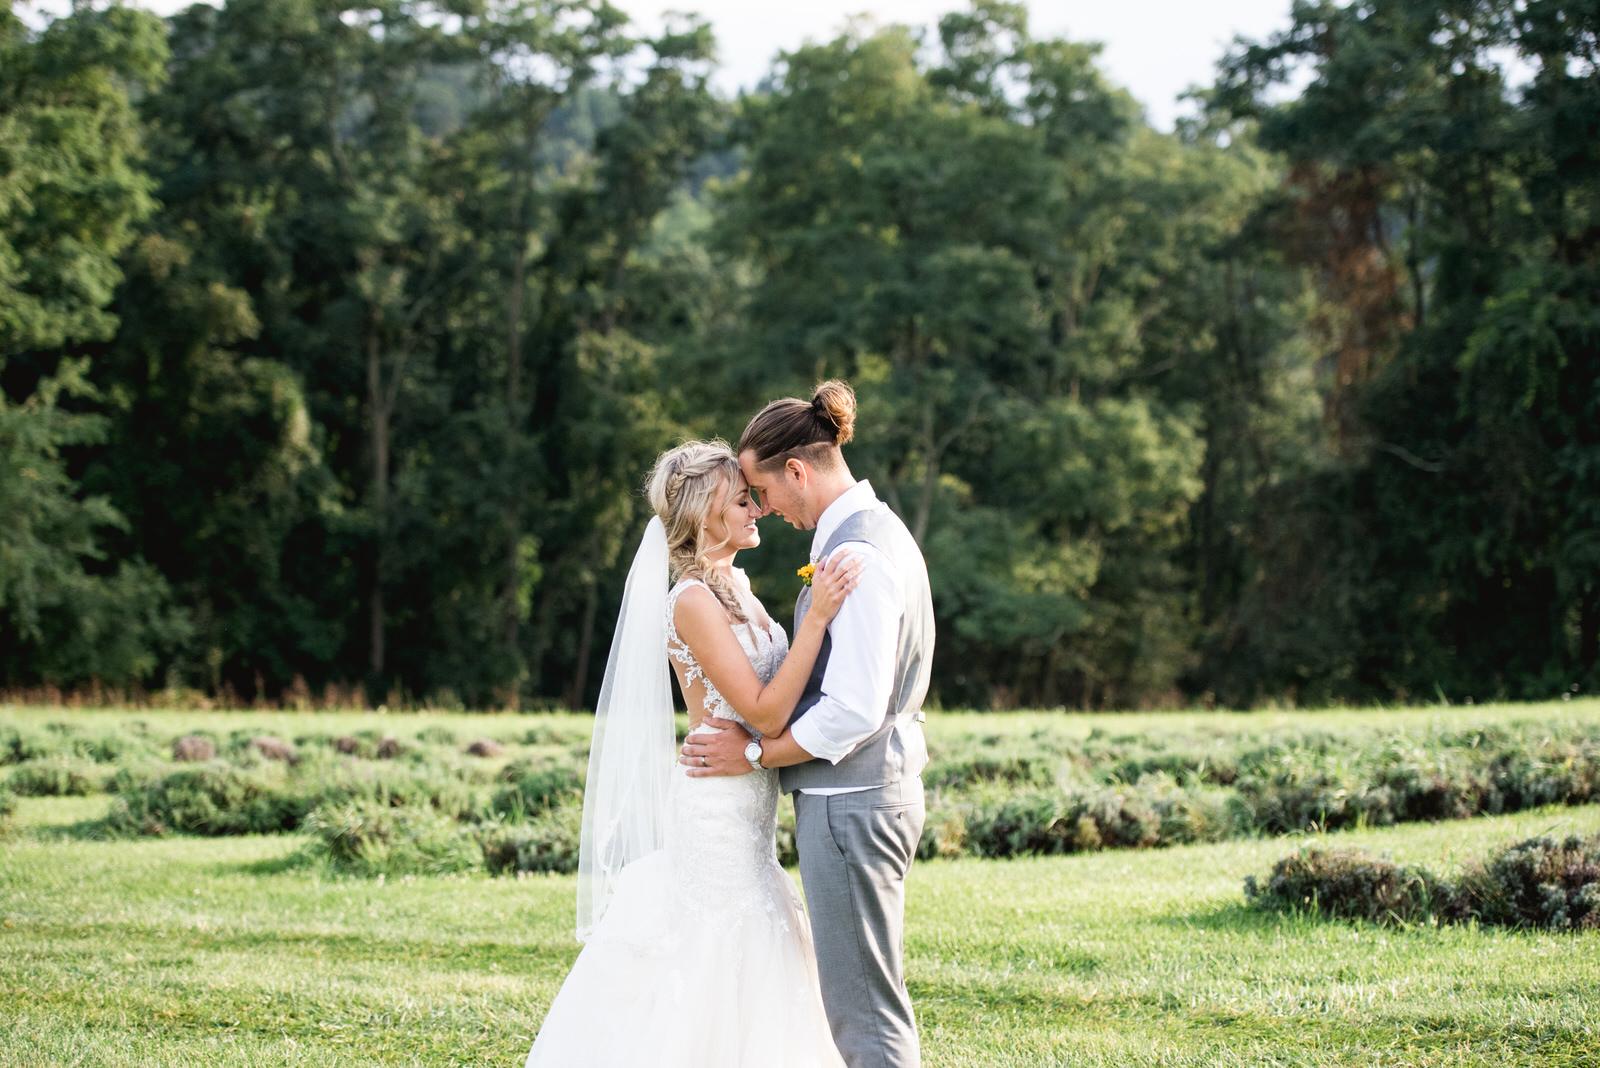 destiny-hill-farm-wedding-photos-pittsburgh-wedding-photographers-51.jpg